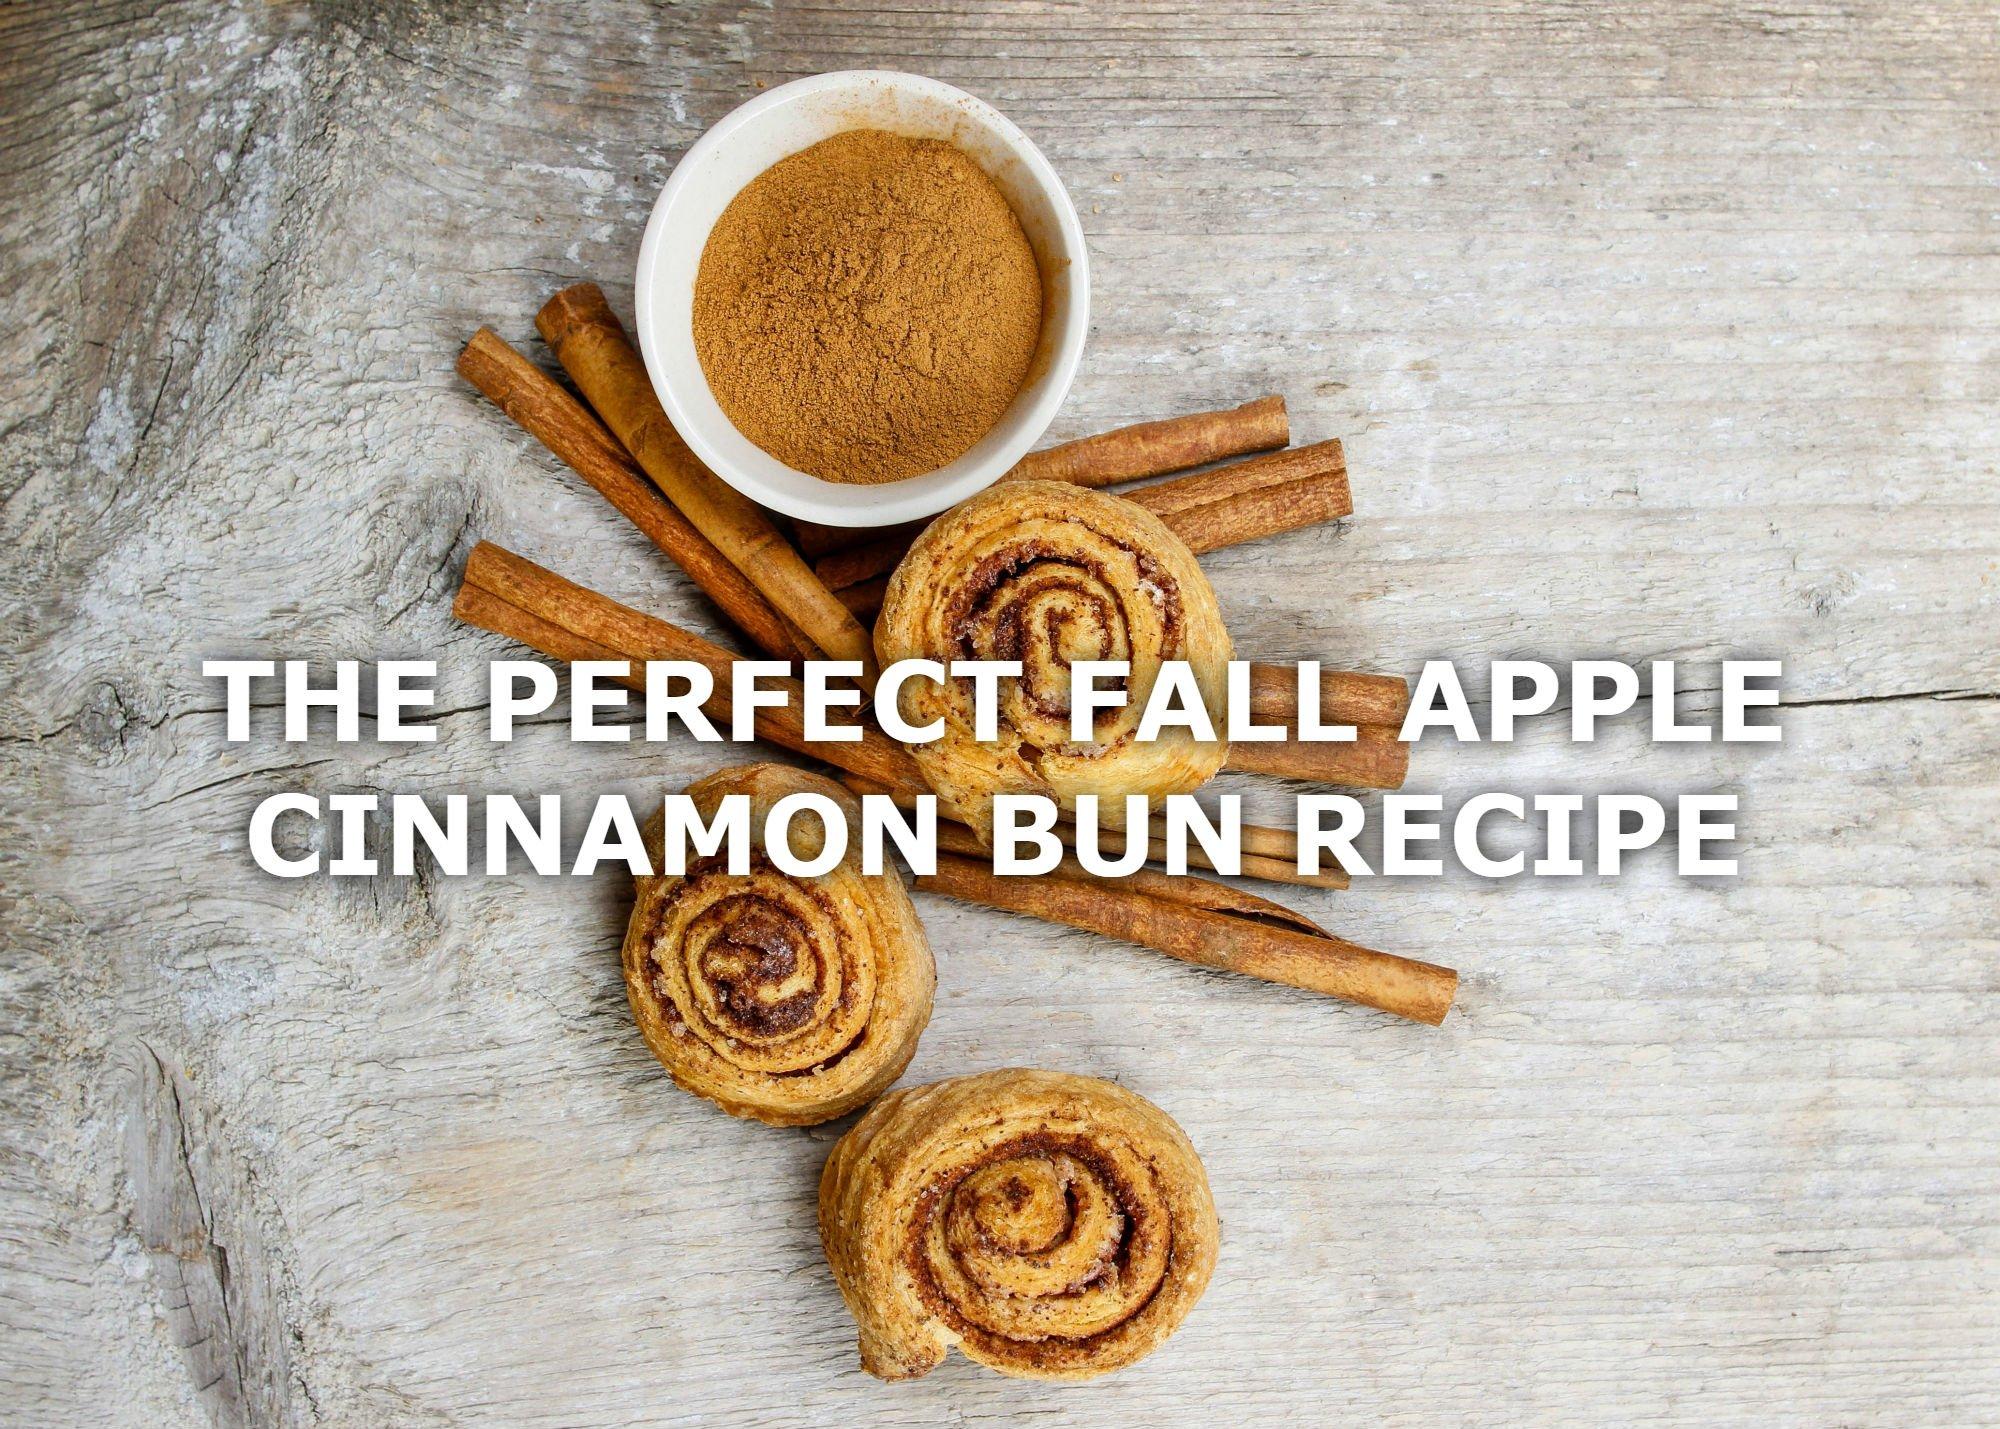 THE PERFECT FALL APPLE CINNAMON BUN RECIPE